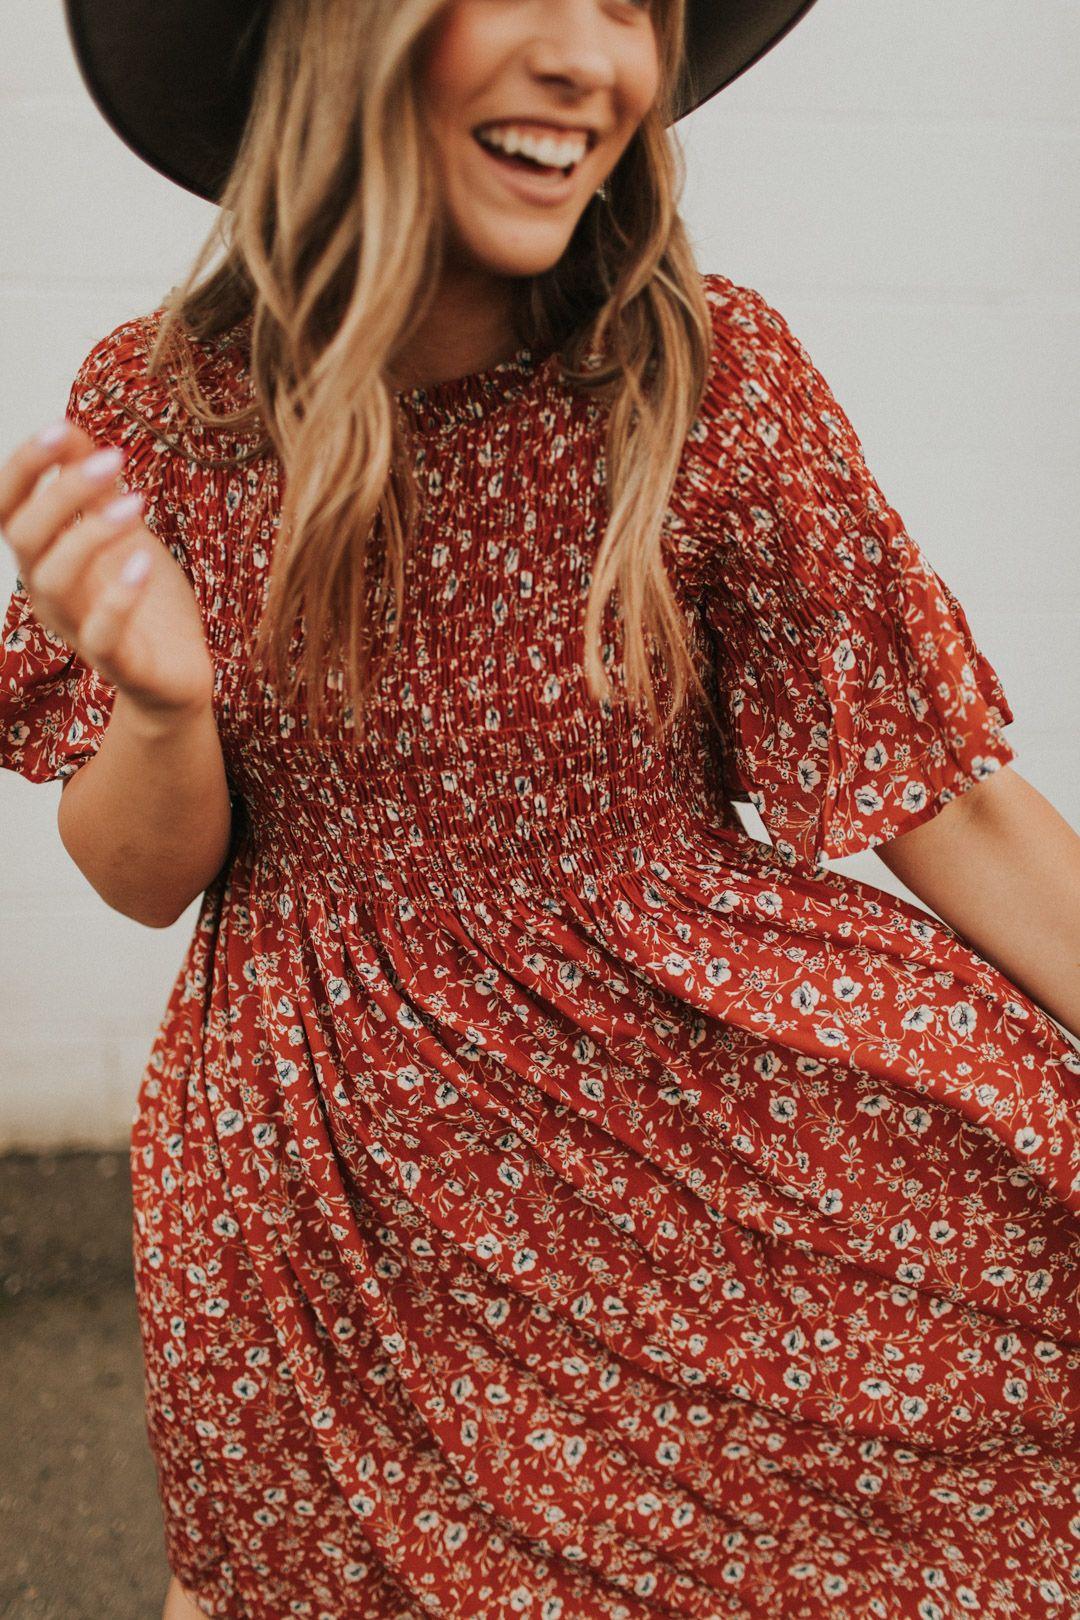 the perfect dress for fall #fall #falldress #falloutfit #churchoutfitfall